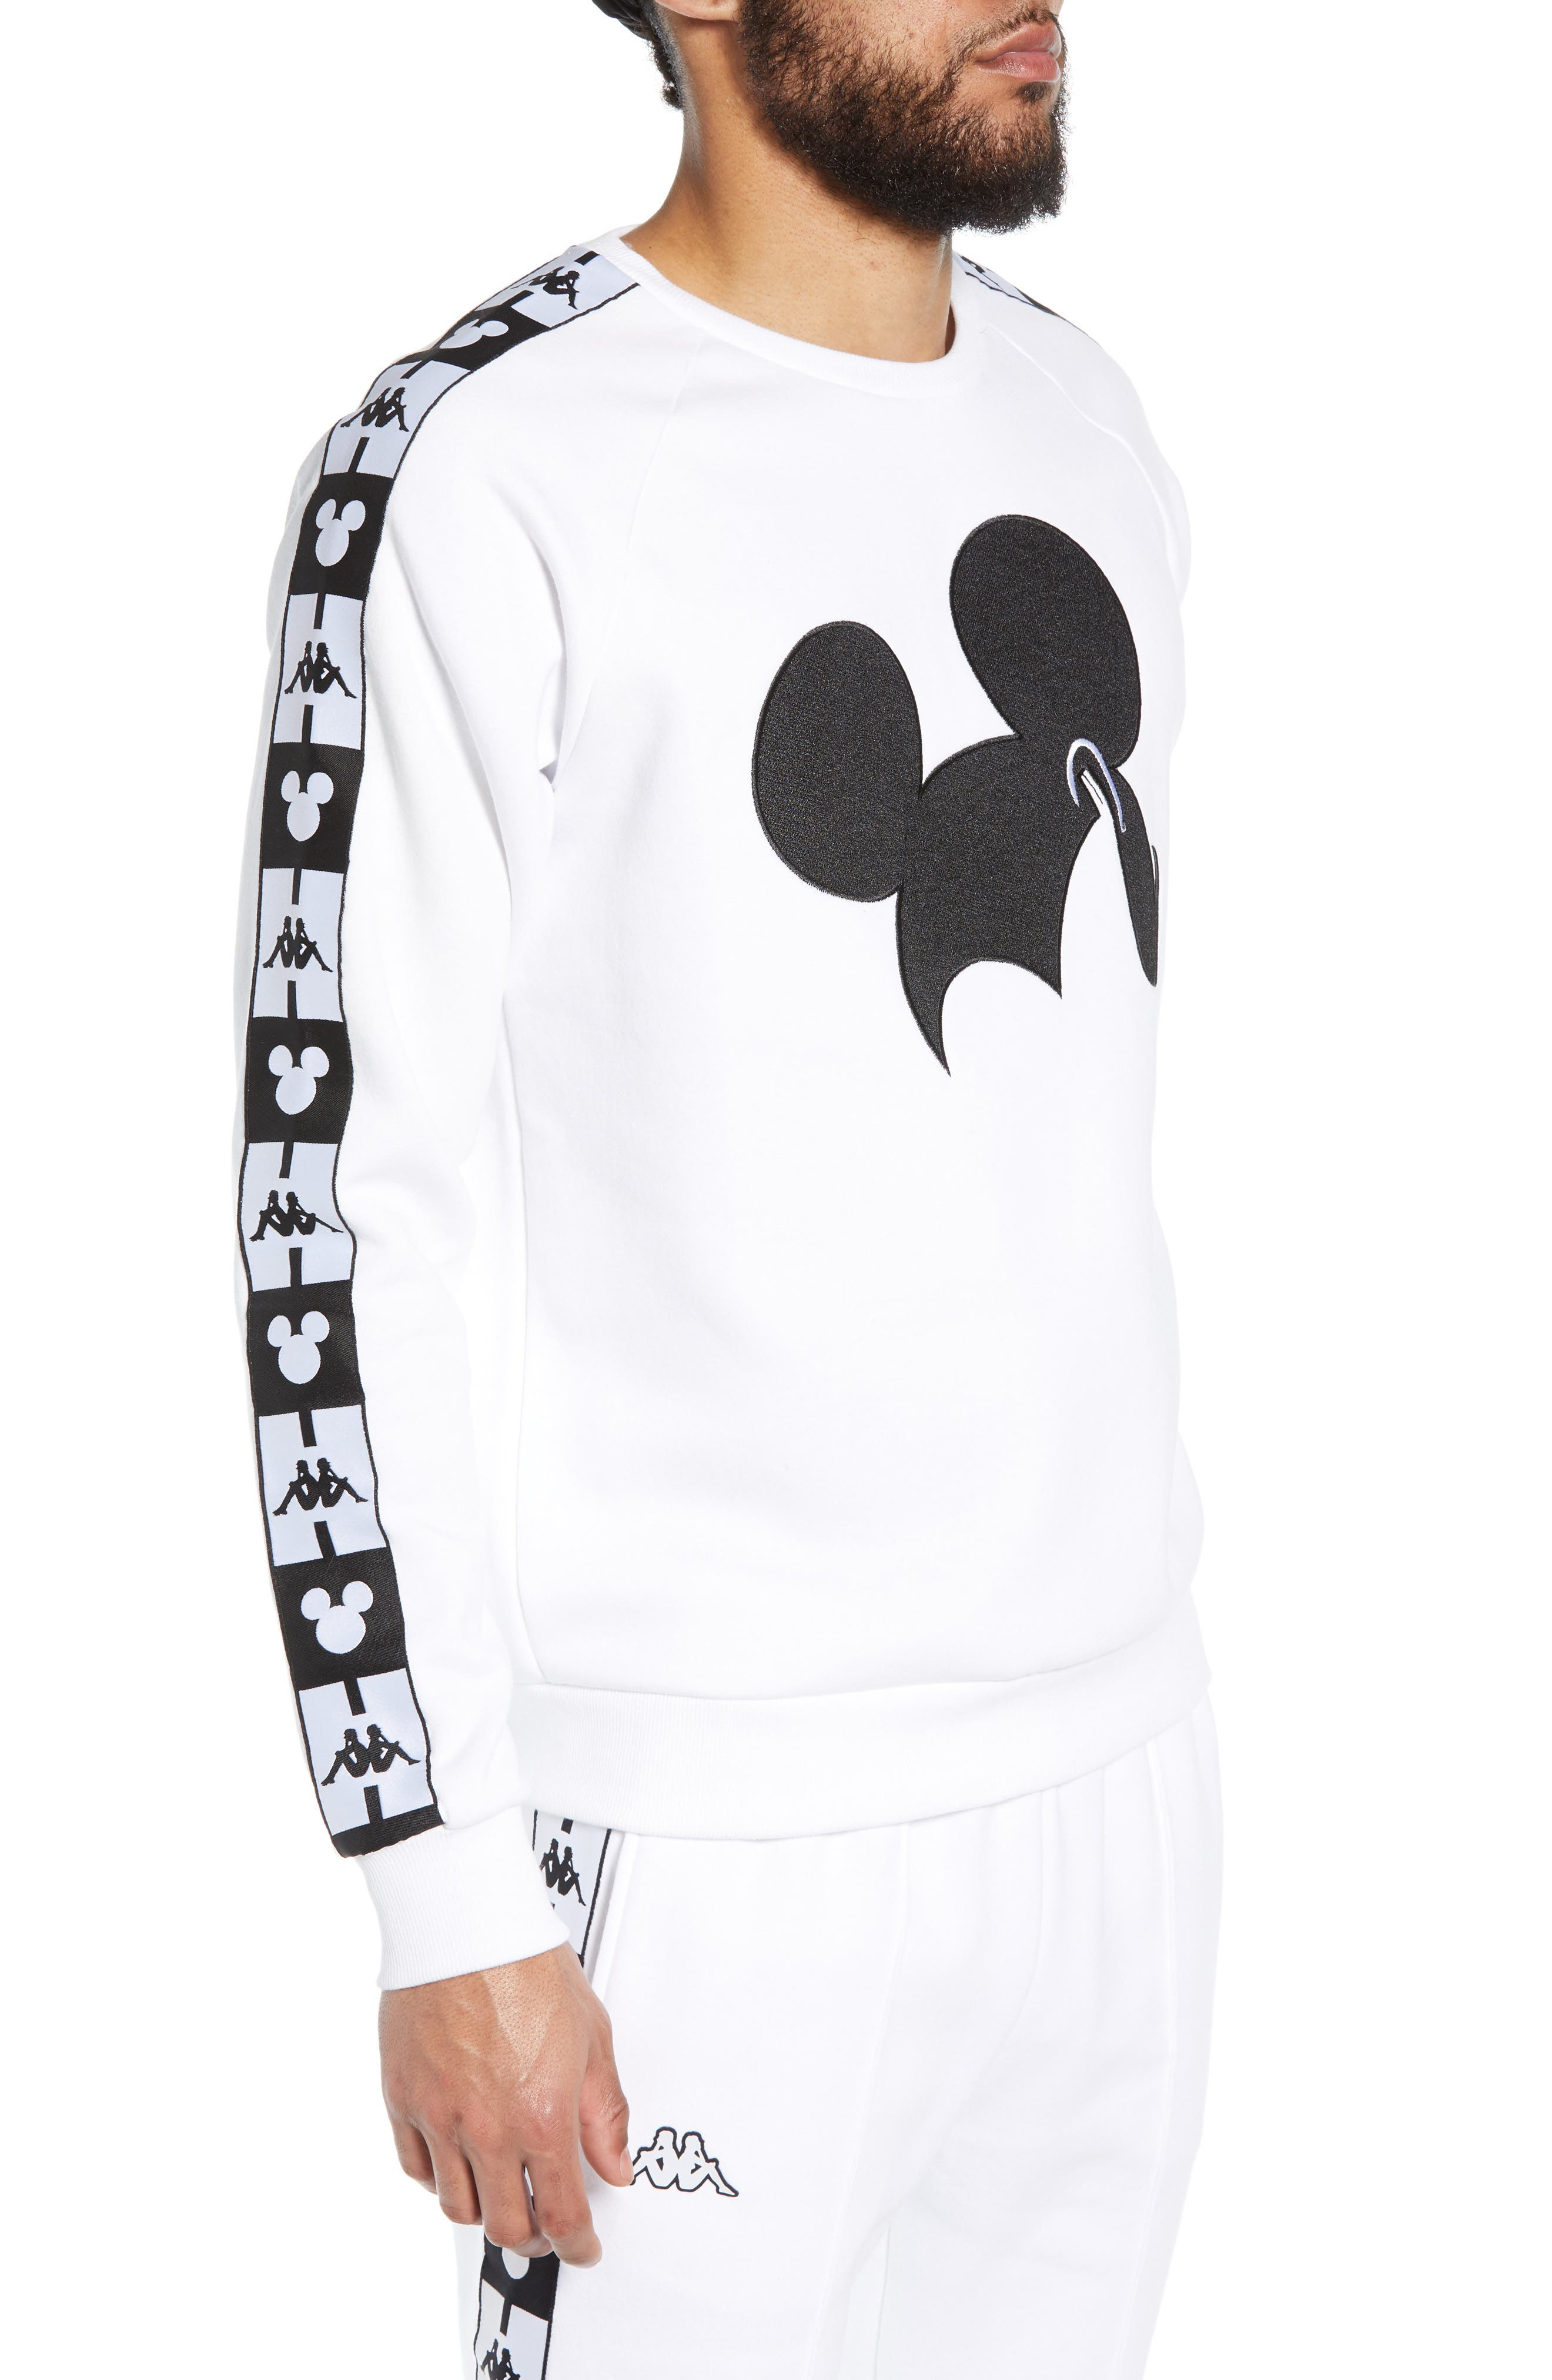 KAPPA,                             x Disney<sup>®</sup> Authentic Audley Sweatshirt,                             Alternate thumbnail 3, color,                             100